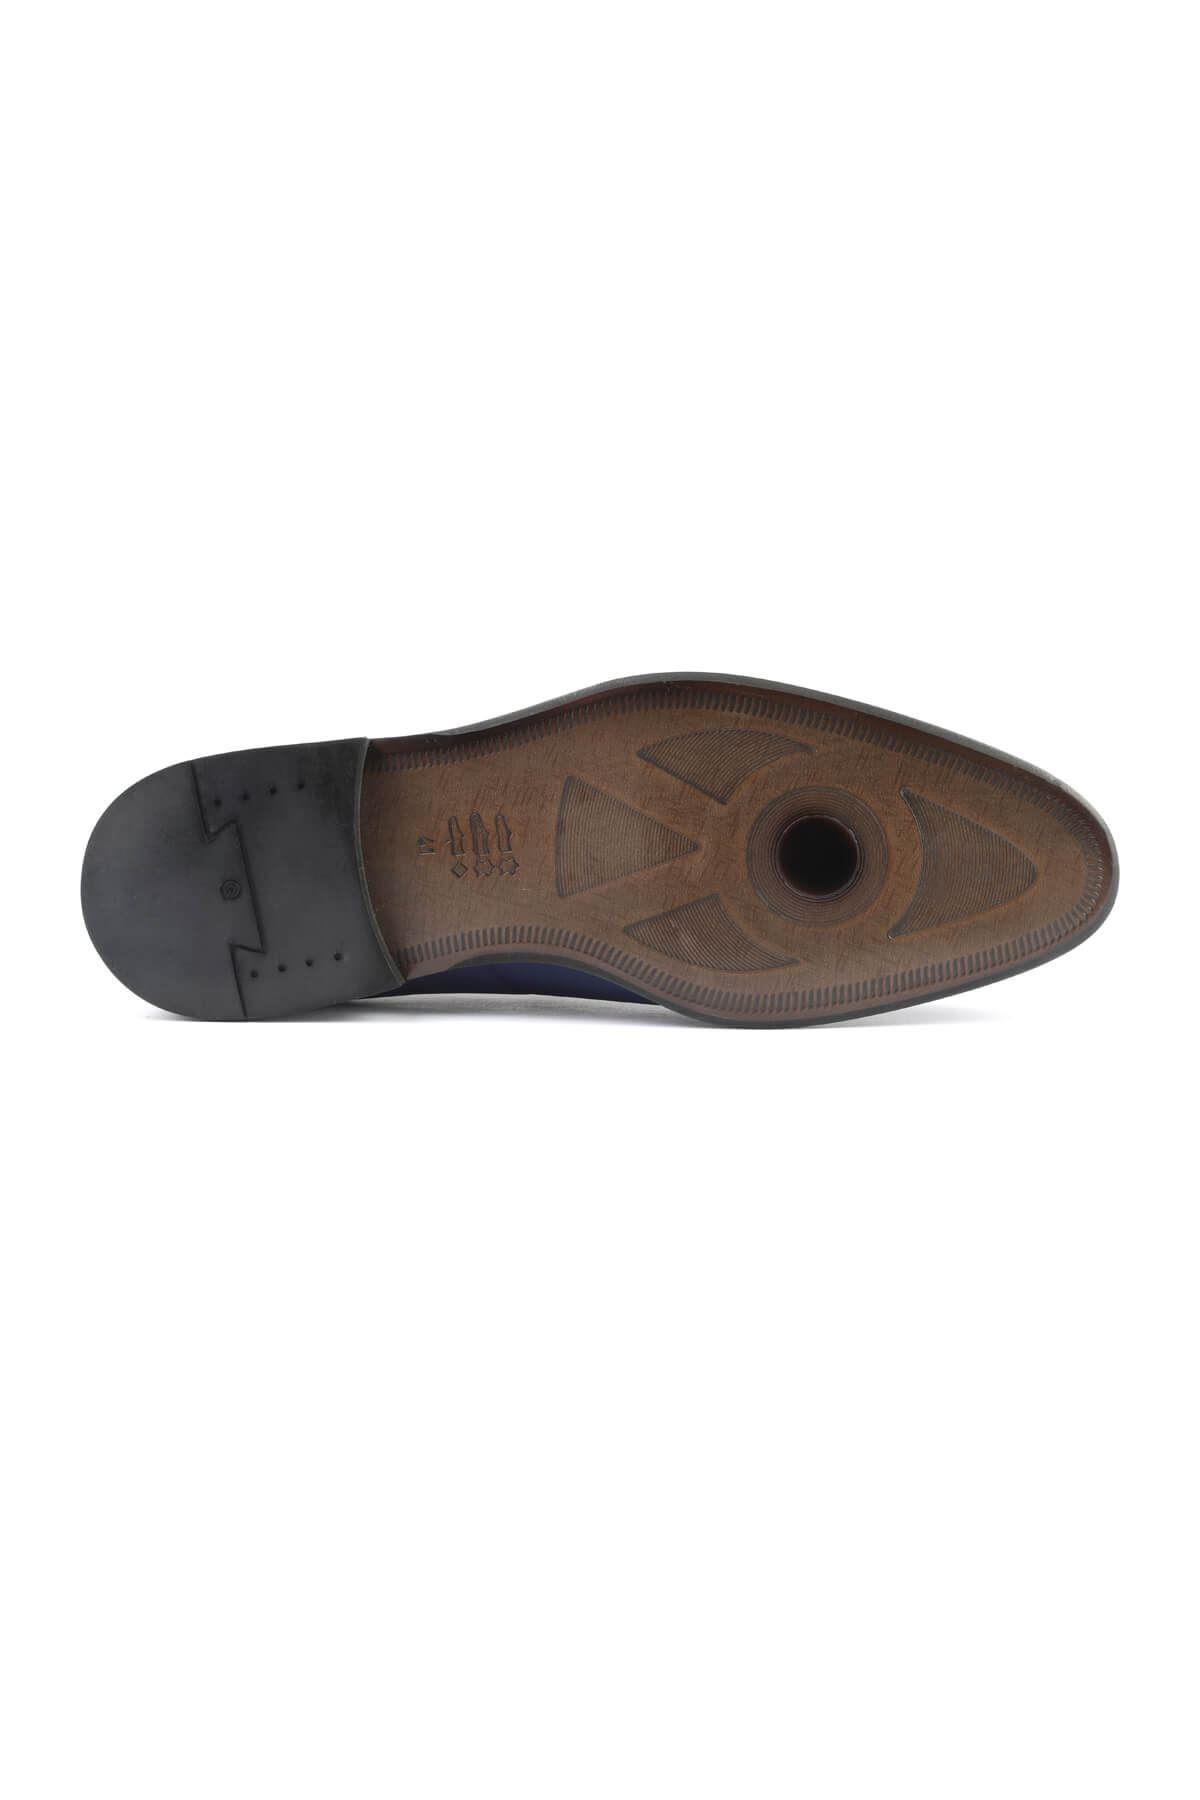 Libero T839 Lacivert Klasik Ayakkabı